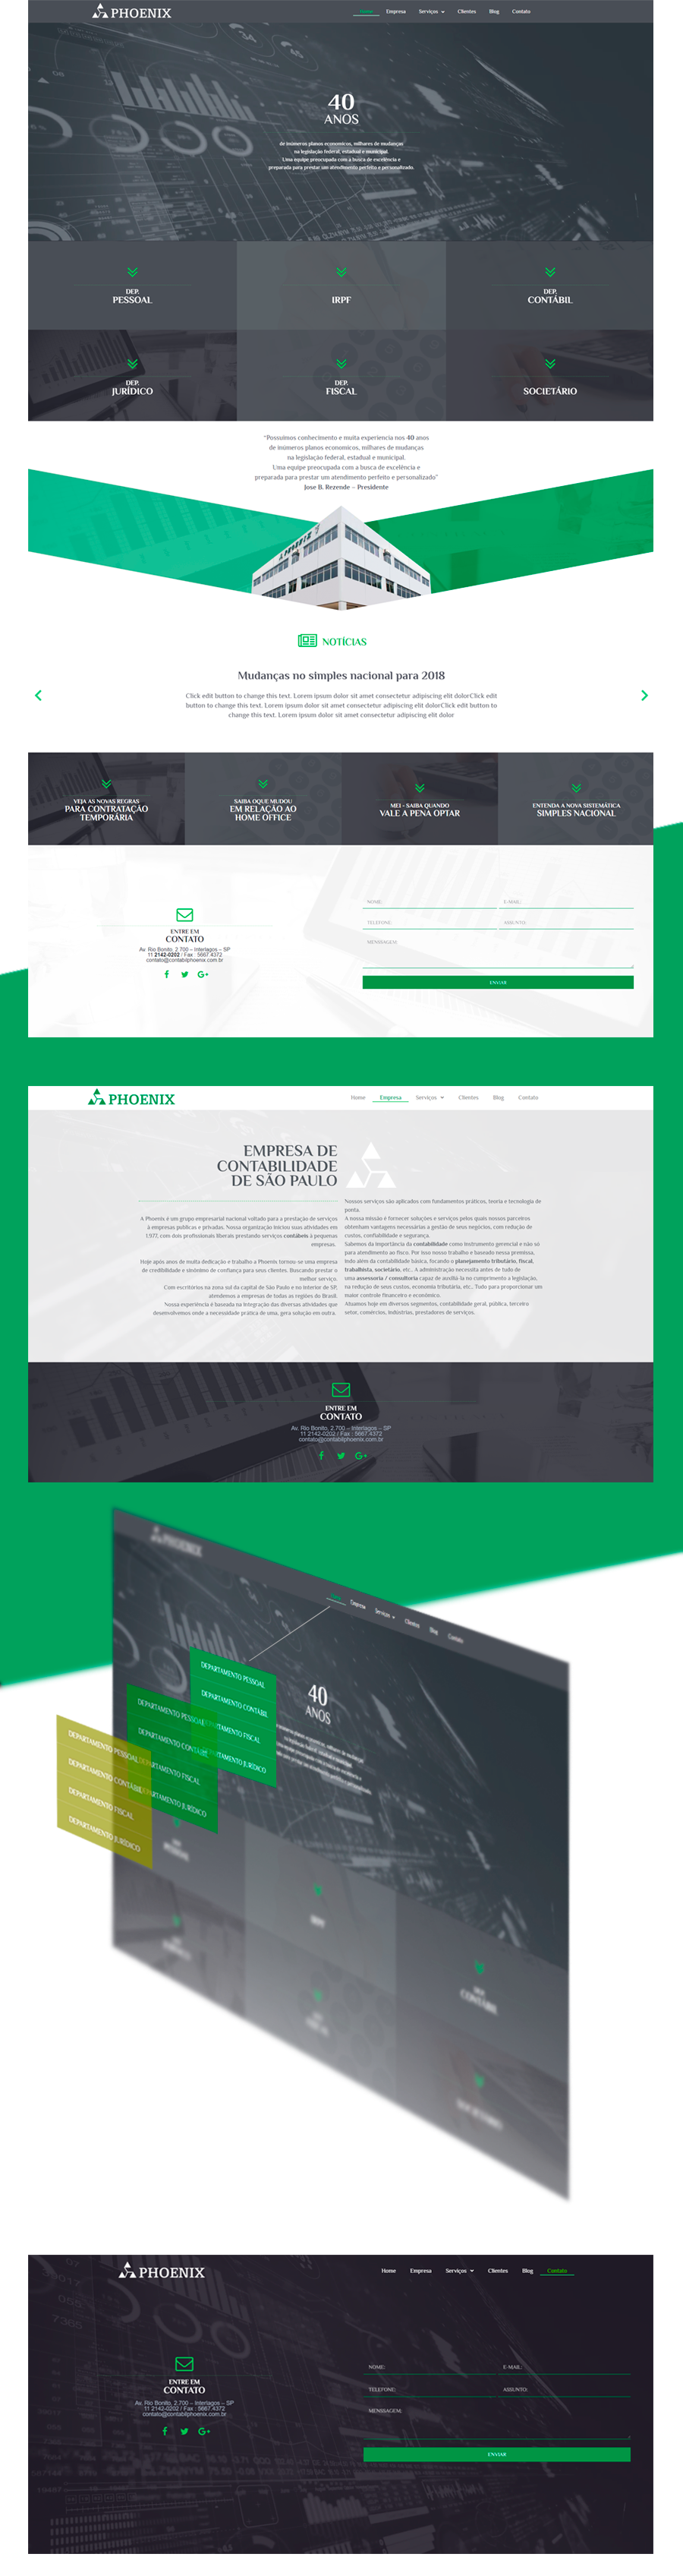 Web Website layoutweb Webdesign wordpress Graphc Design